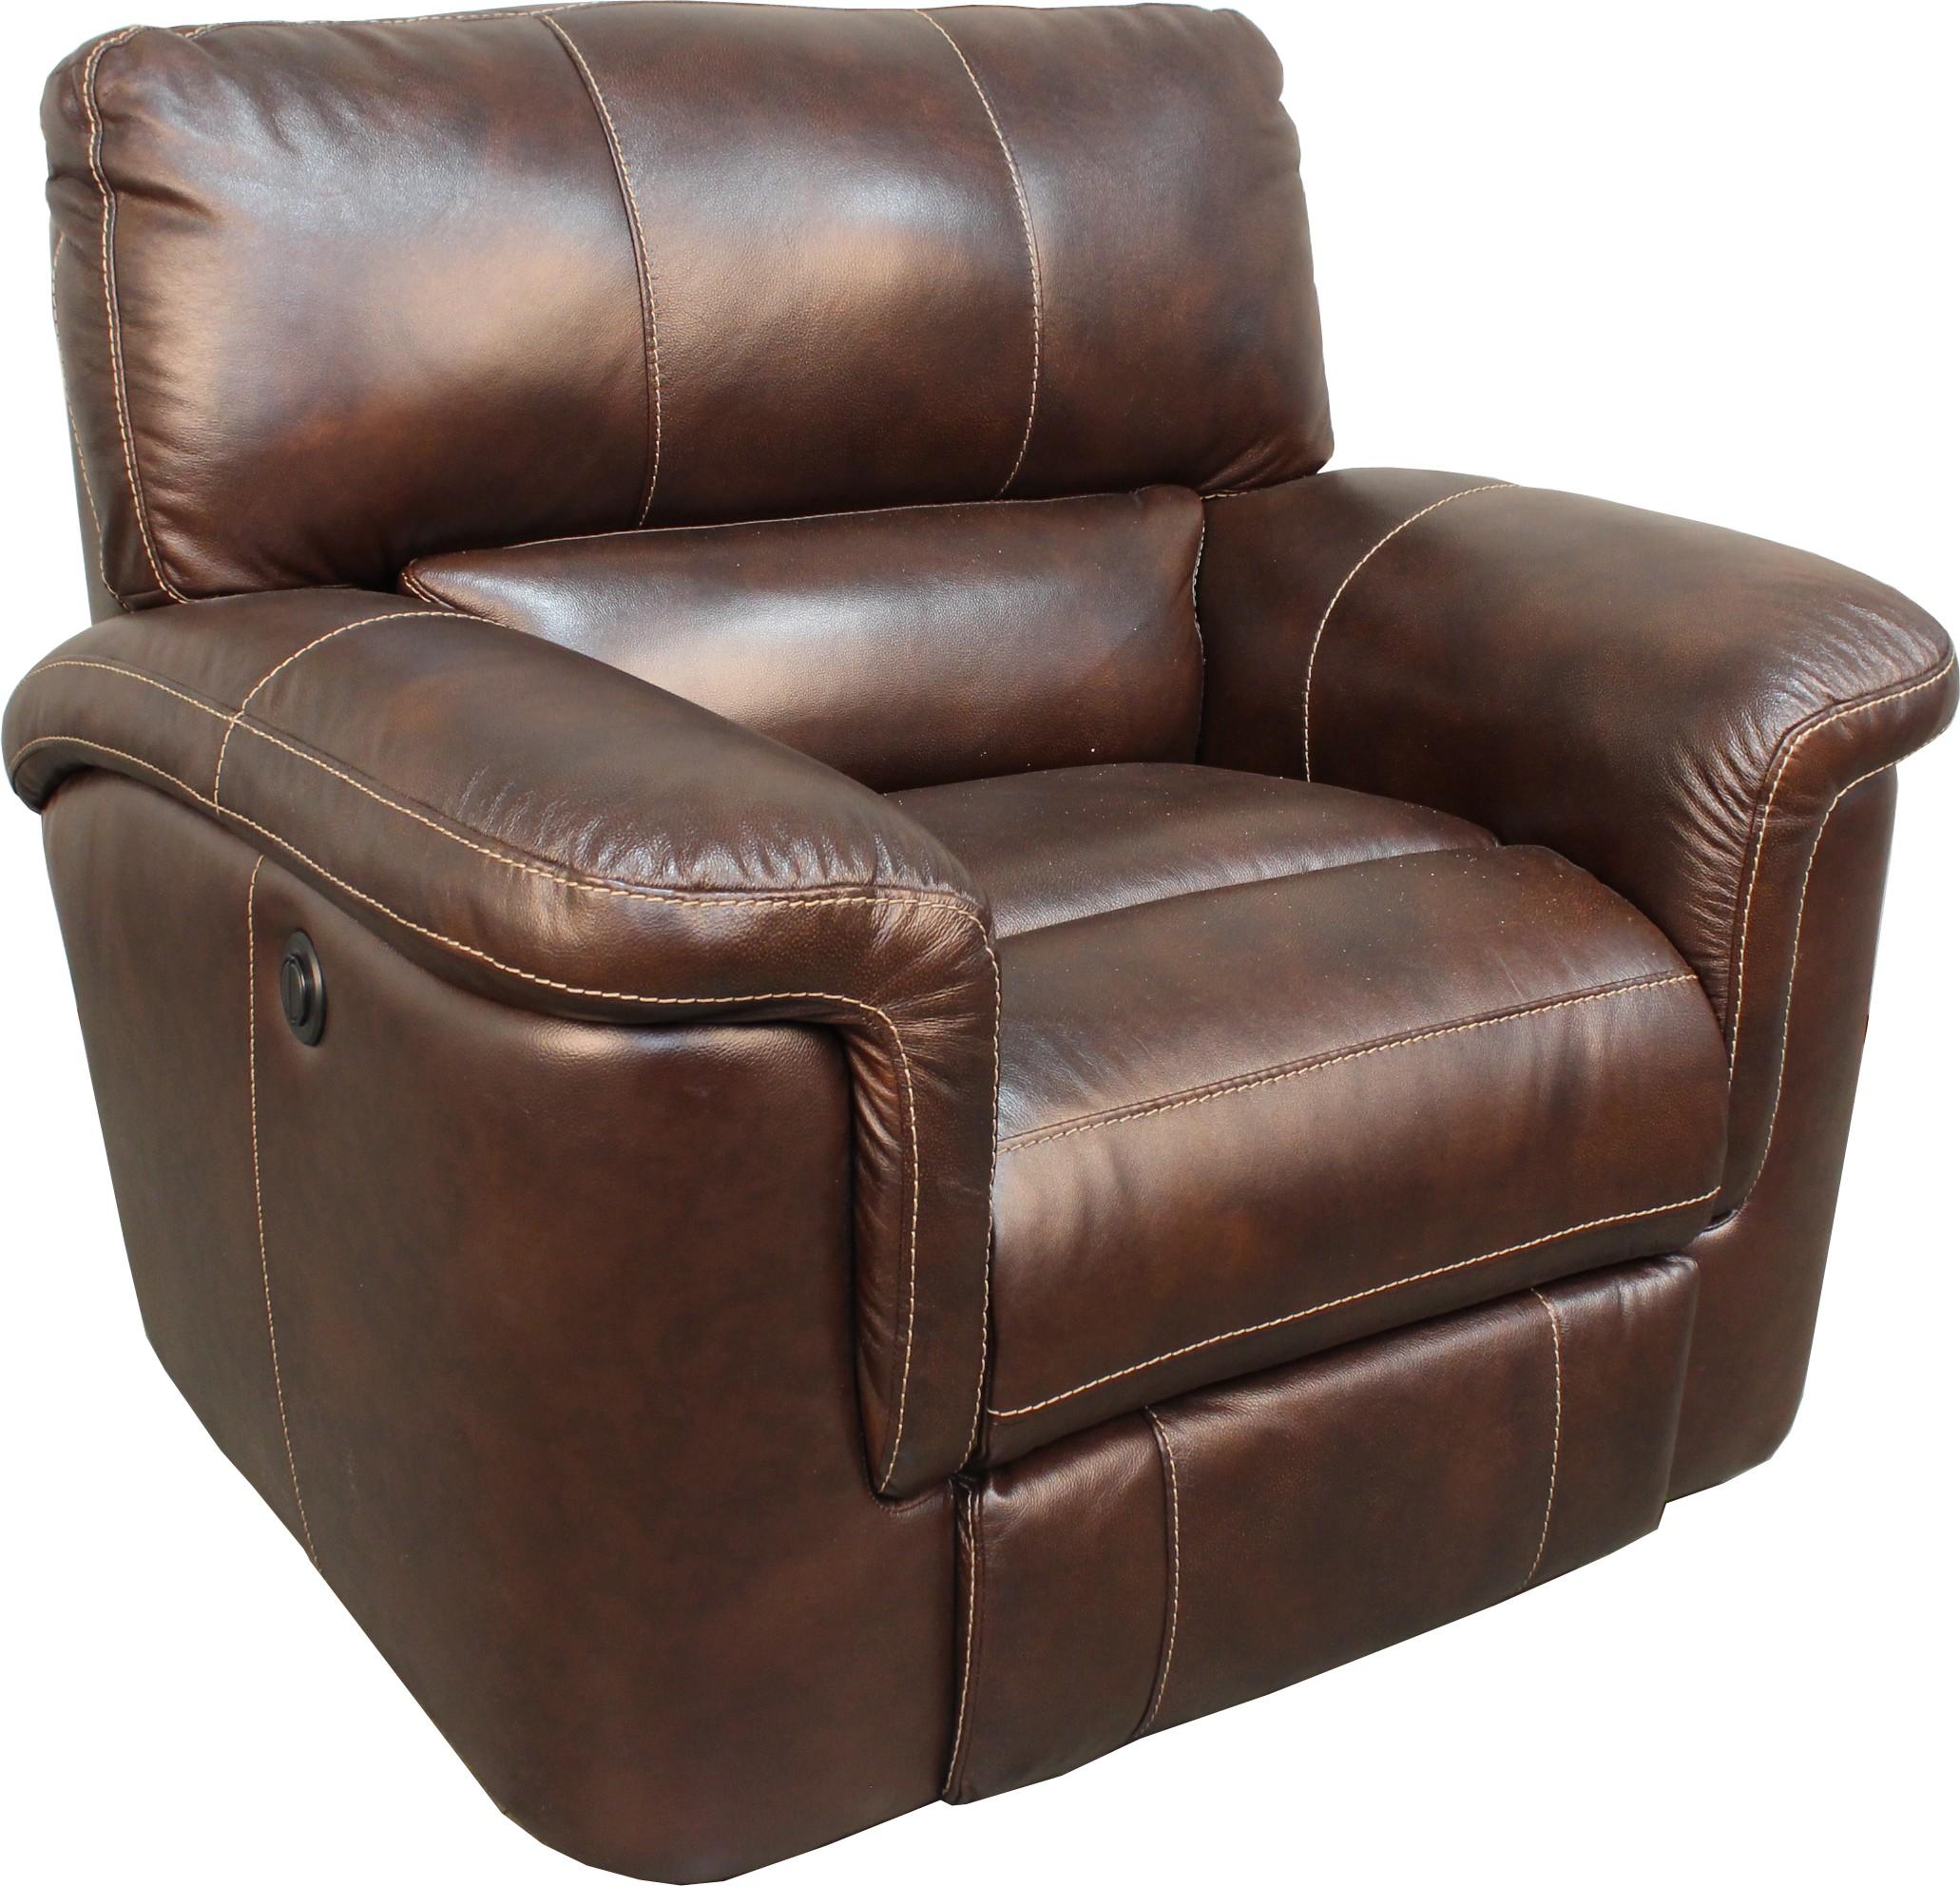 parker leather sofa reviews designer sets singapore hitchcock cigar dual power reclining living room set from